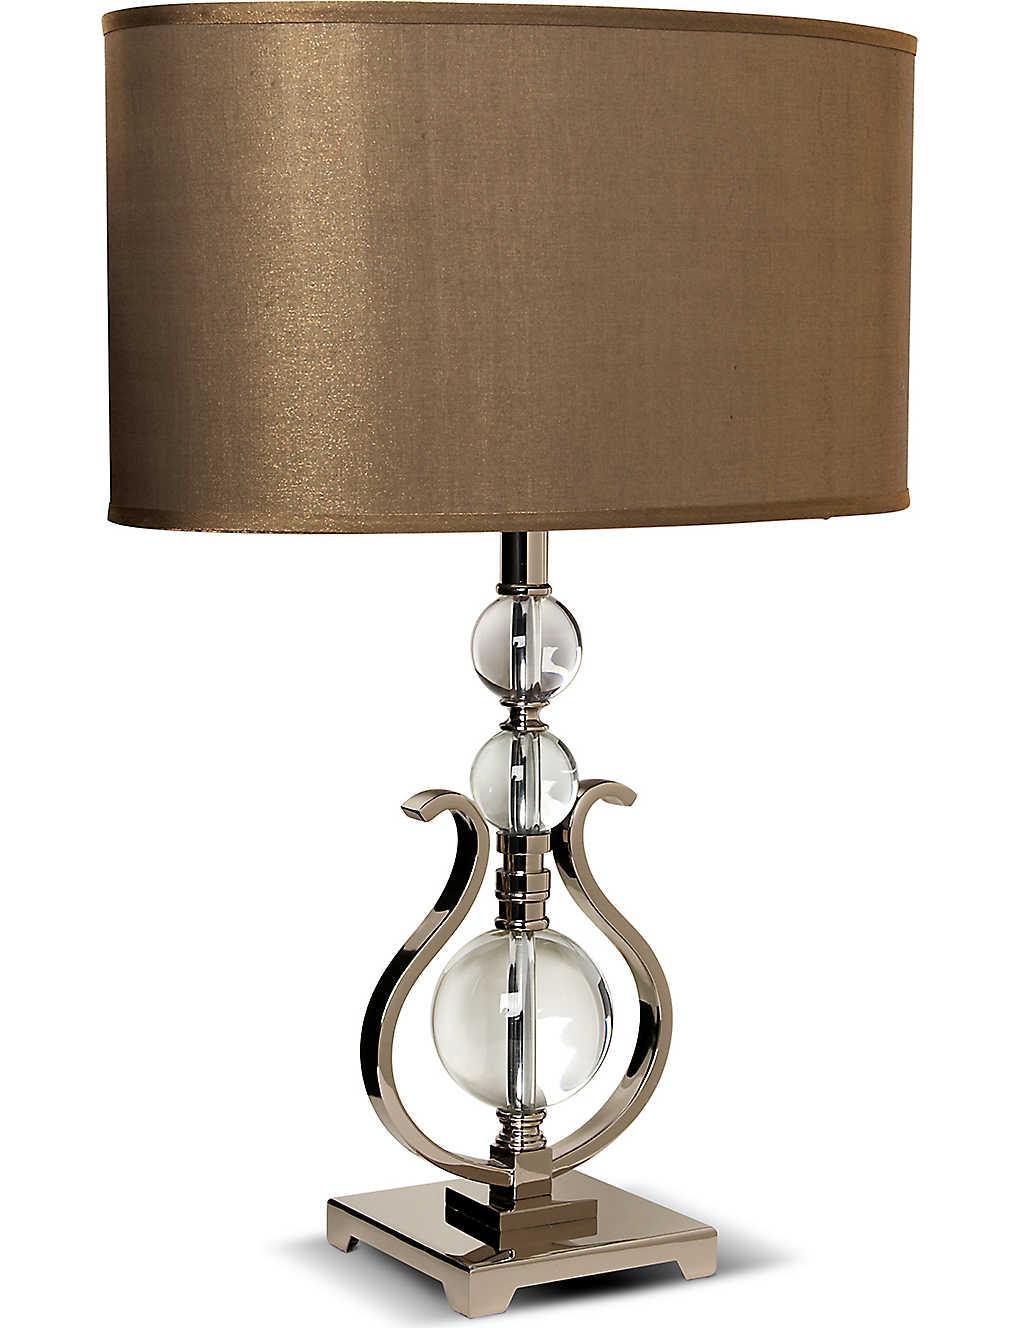 LIGHT SHOP Echo table lamp |